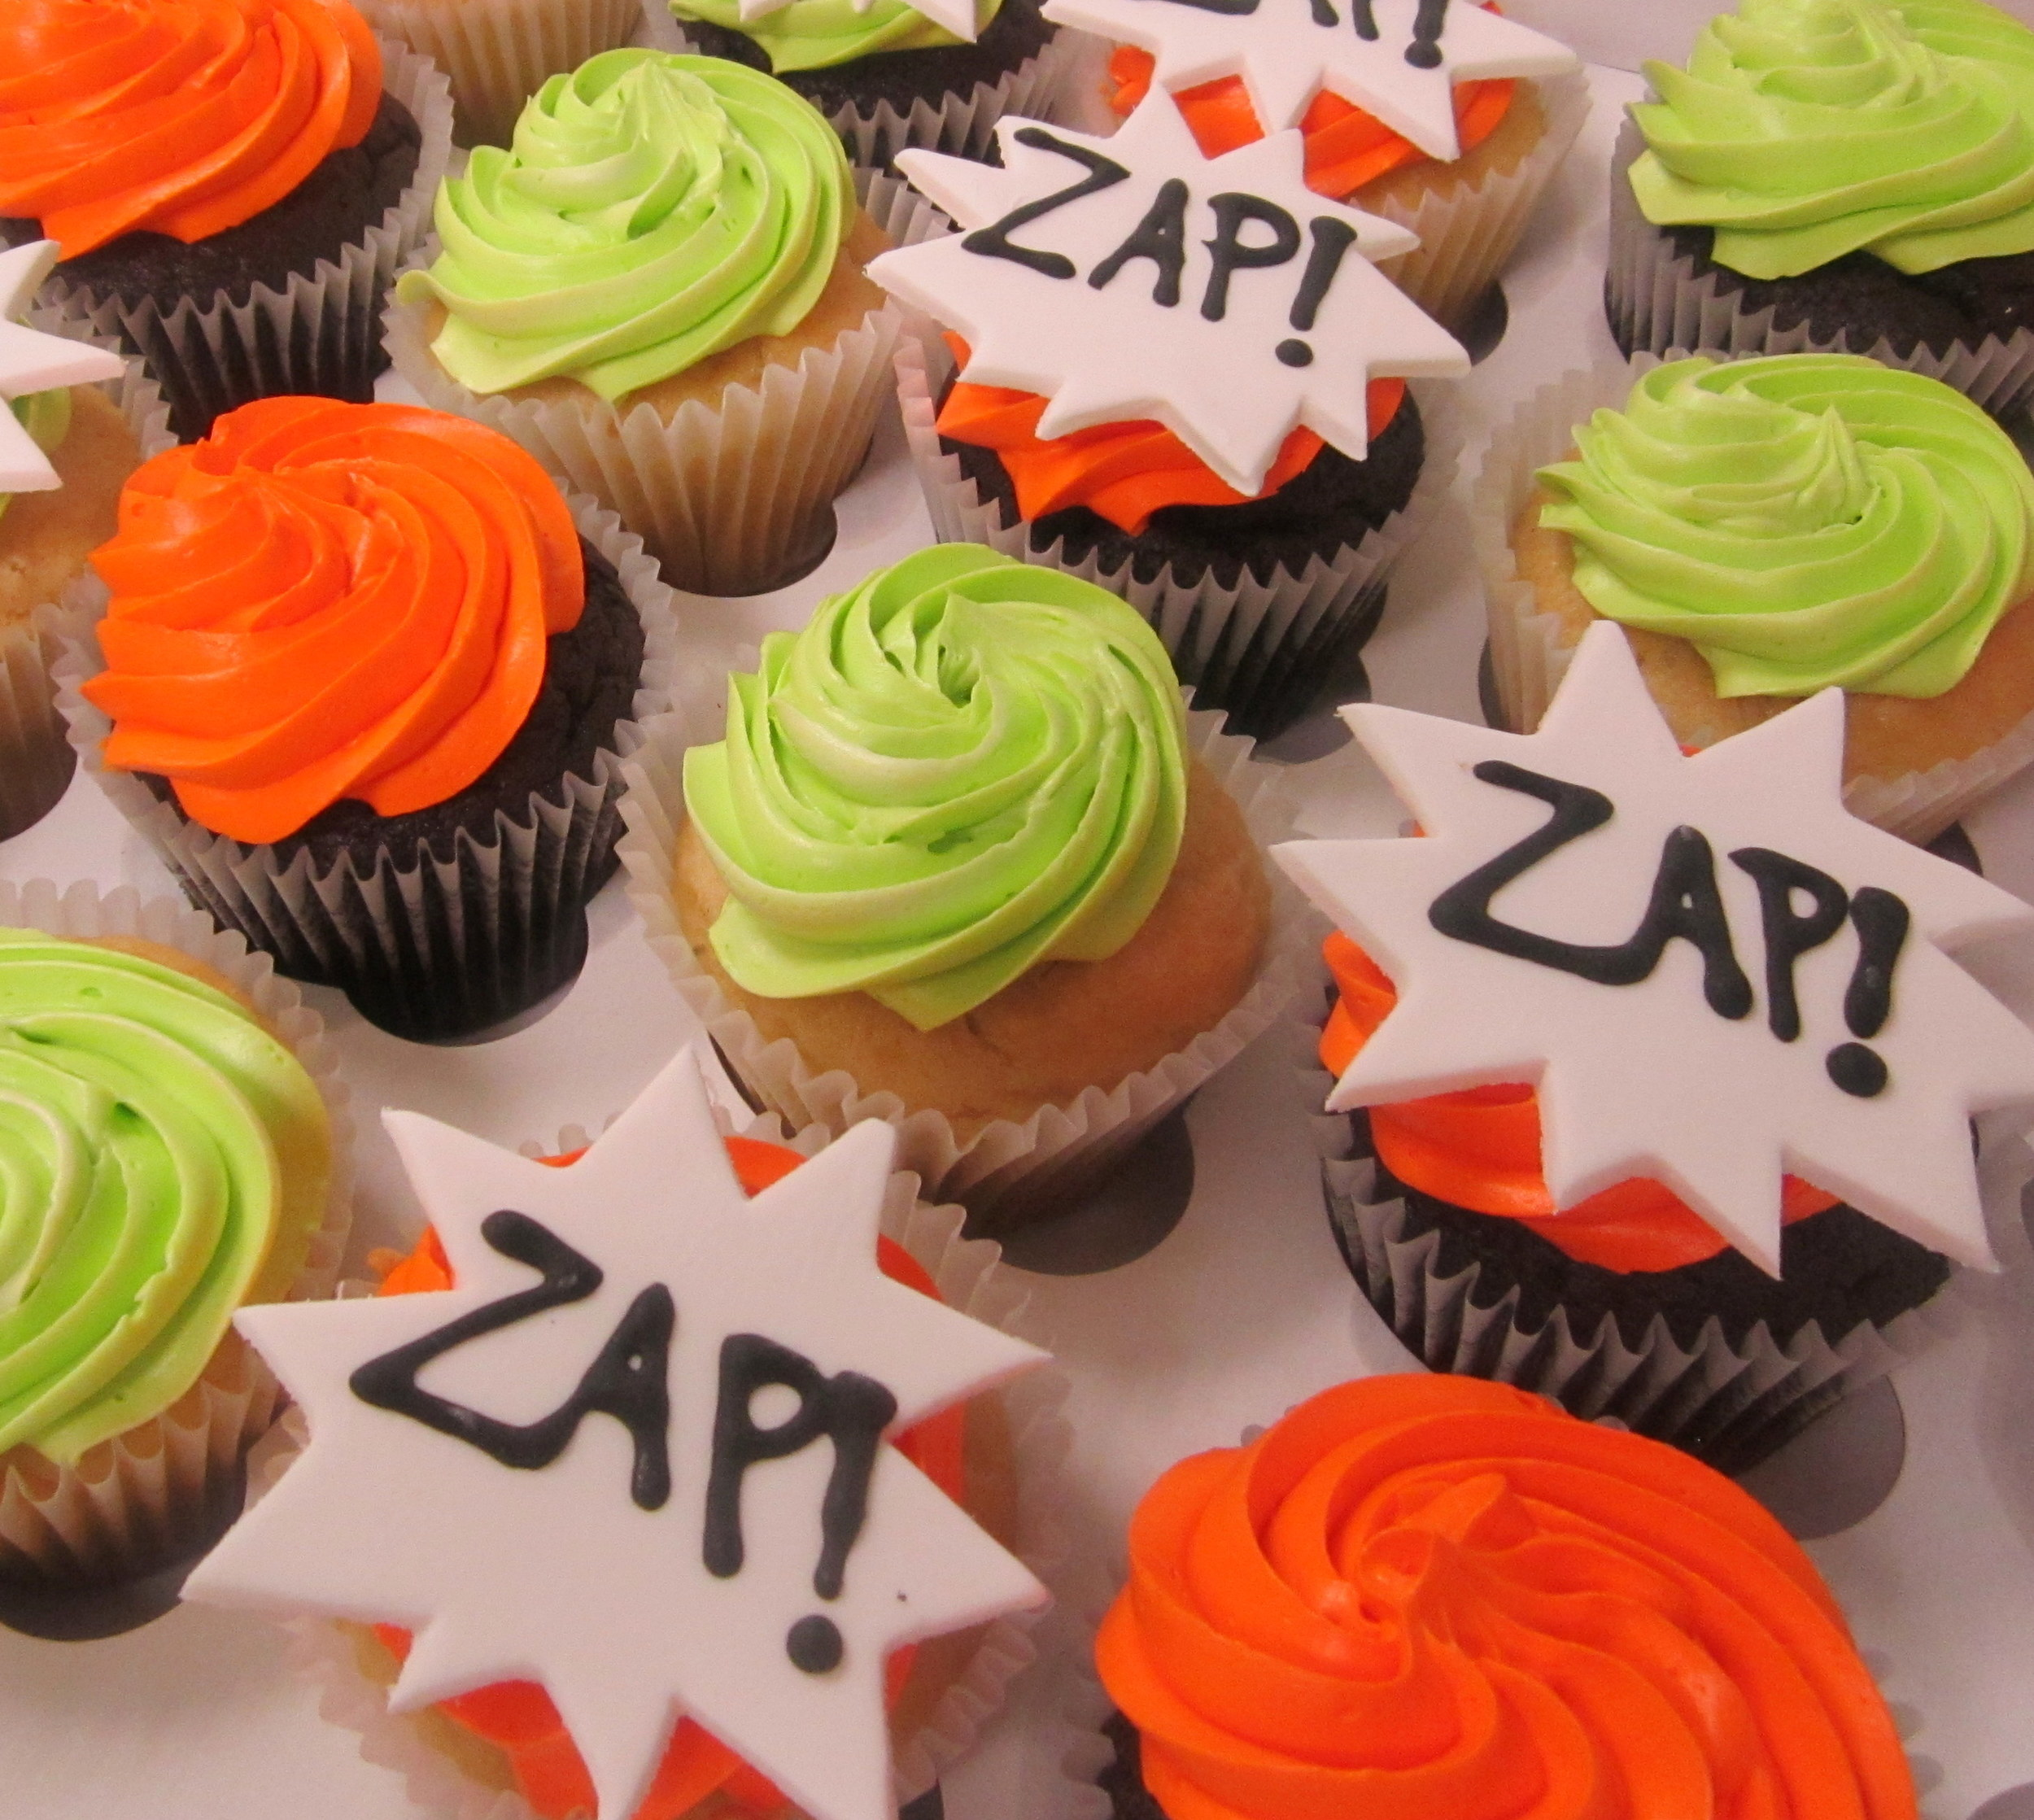 cupcakes- zap and orange green.jpg